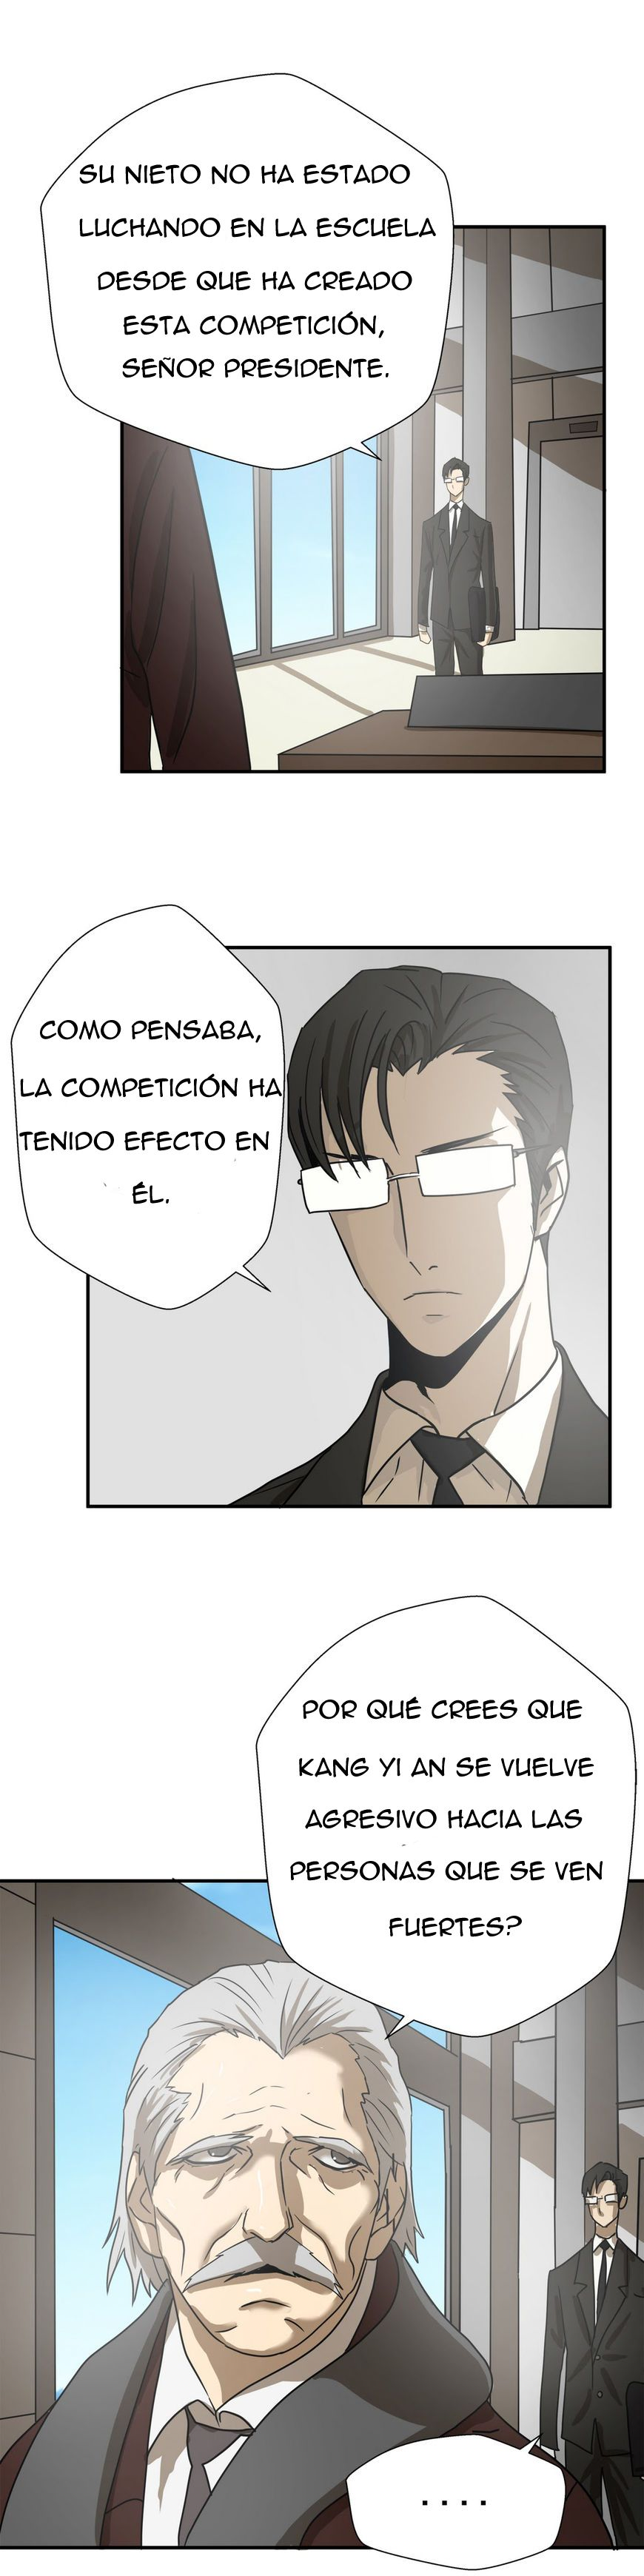 https://c5.ninemanga.com/es_manga/58/19386/461841/f65c00c041bab77ab44874be15c53276.jpg Page 7